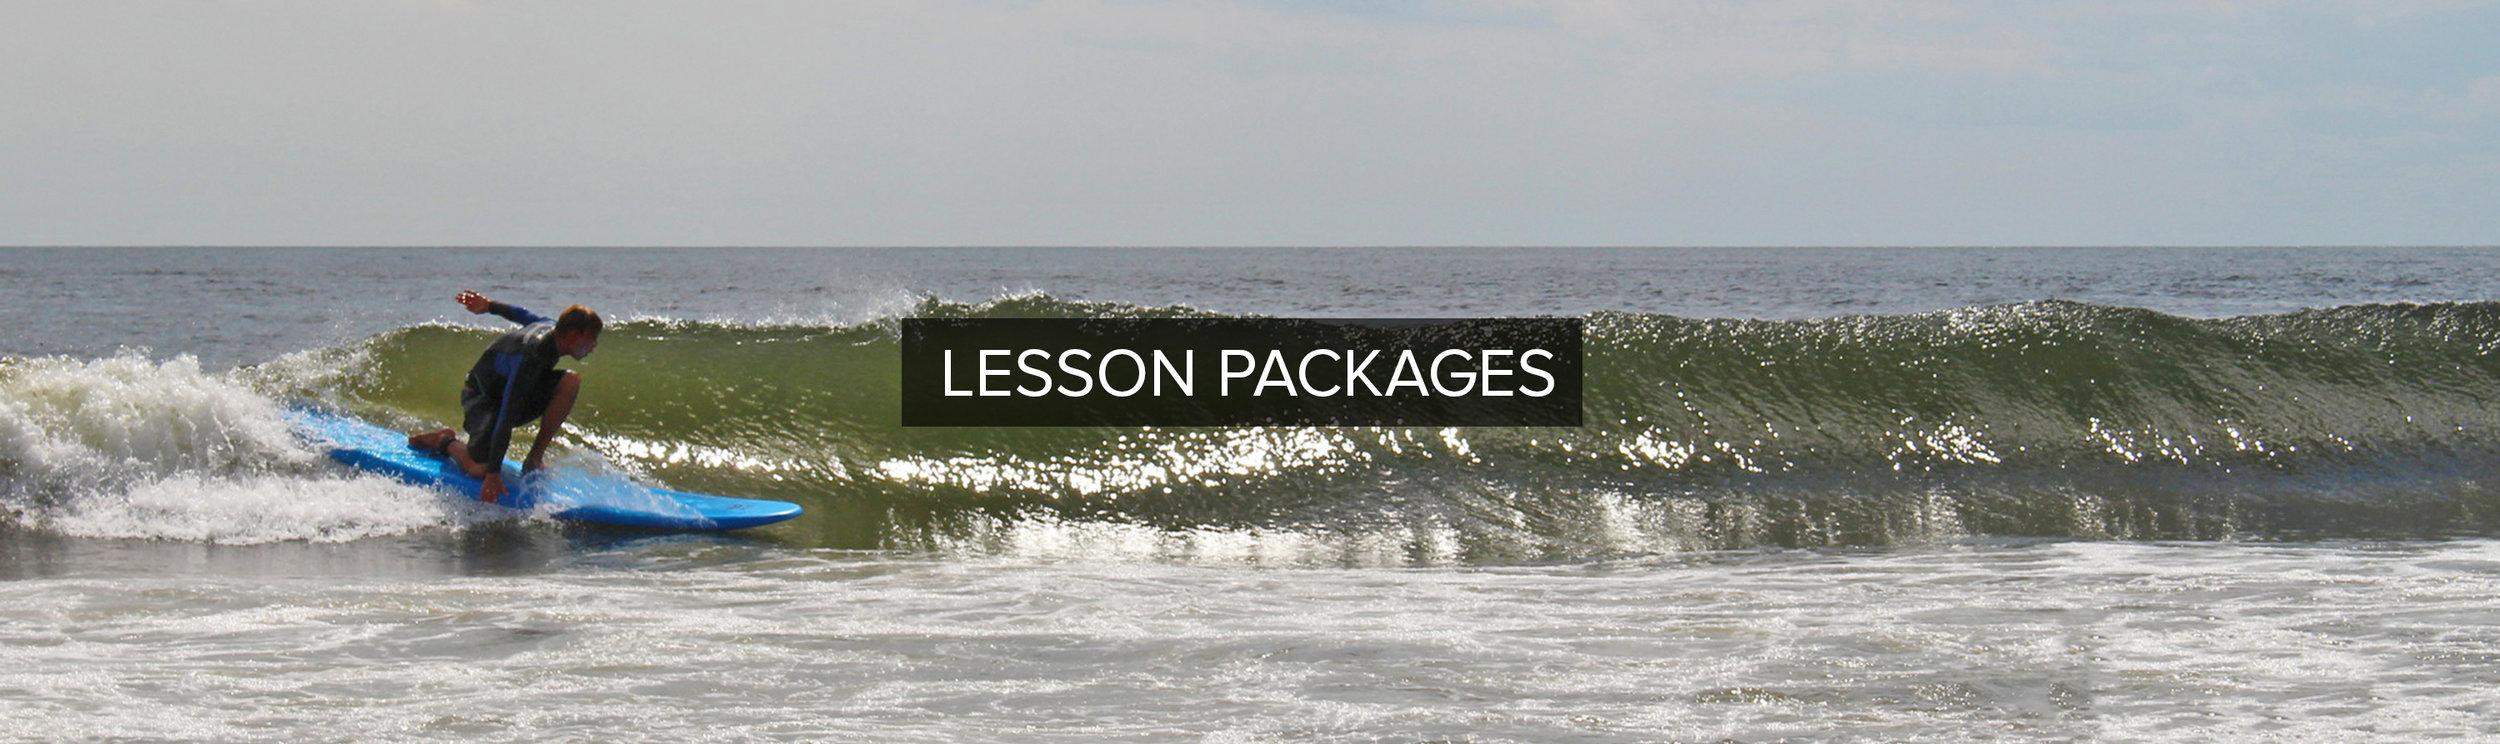 Package Slider 1.jpg